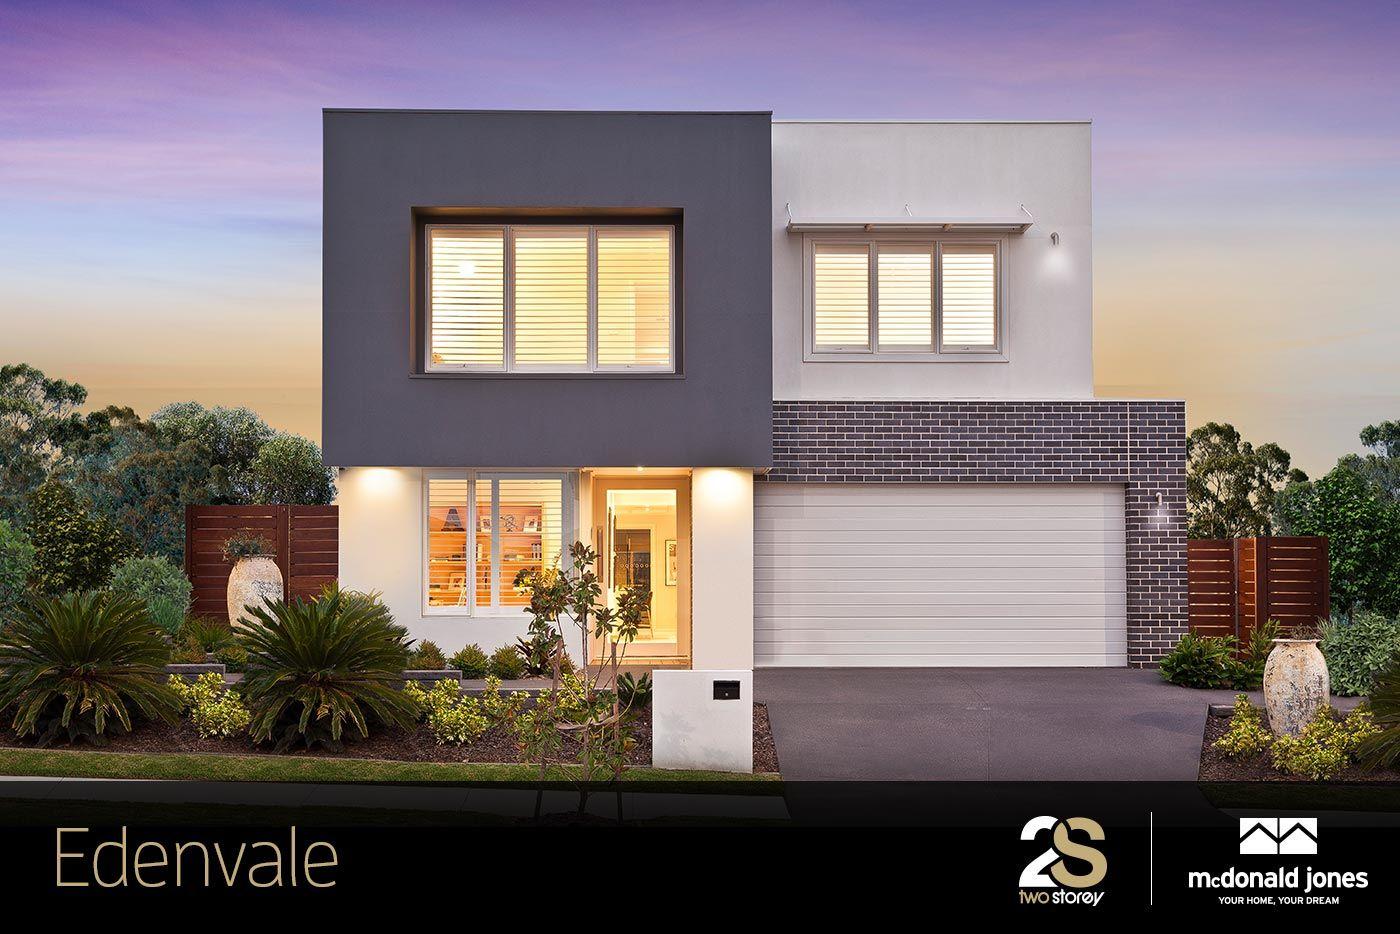 Edenvale Home Decor Ideas: The Mailibu Facade On The Edenvale Two Storey Home. The